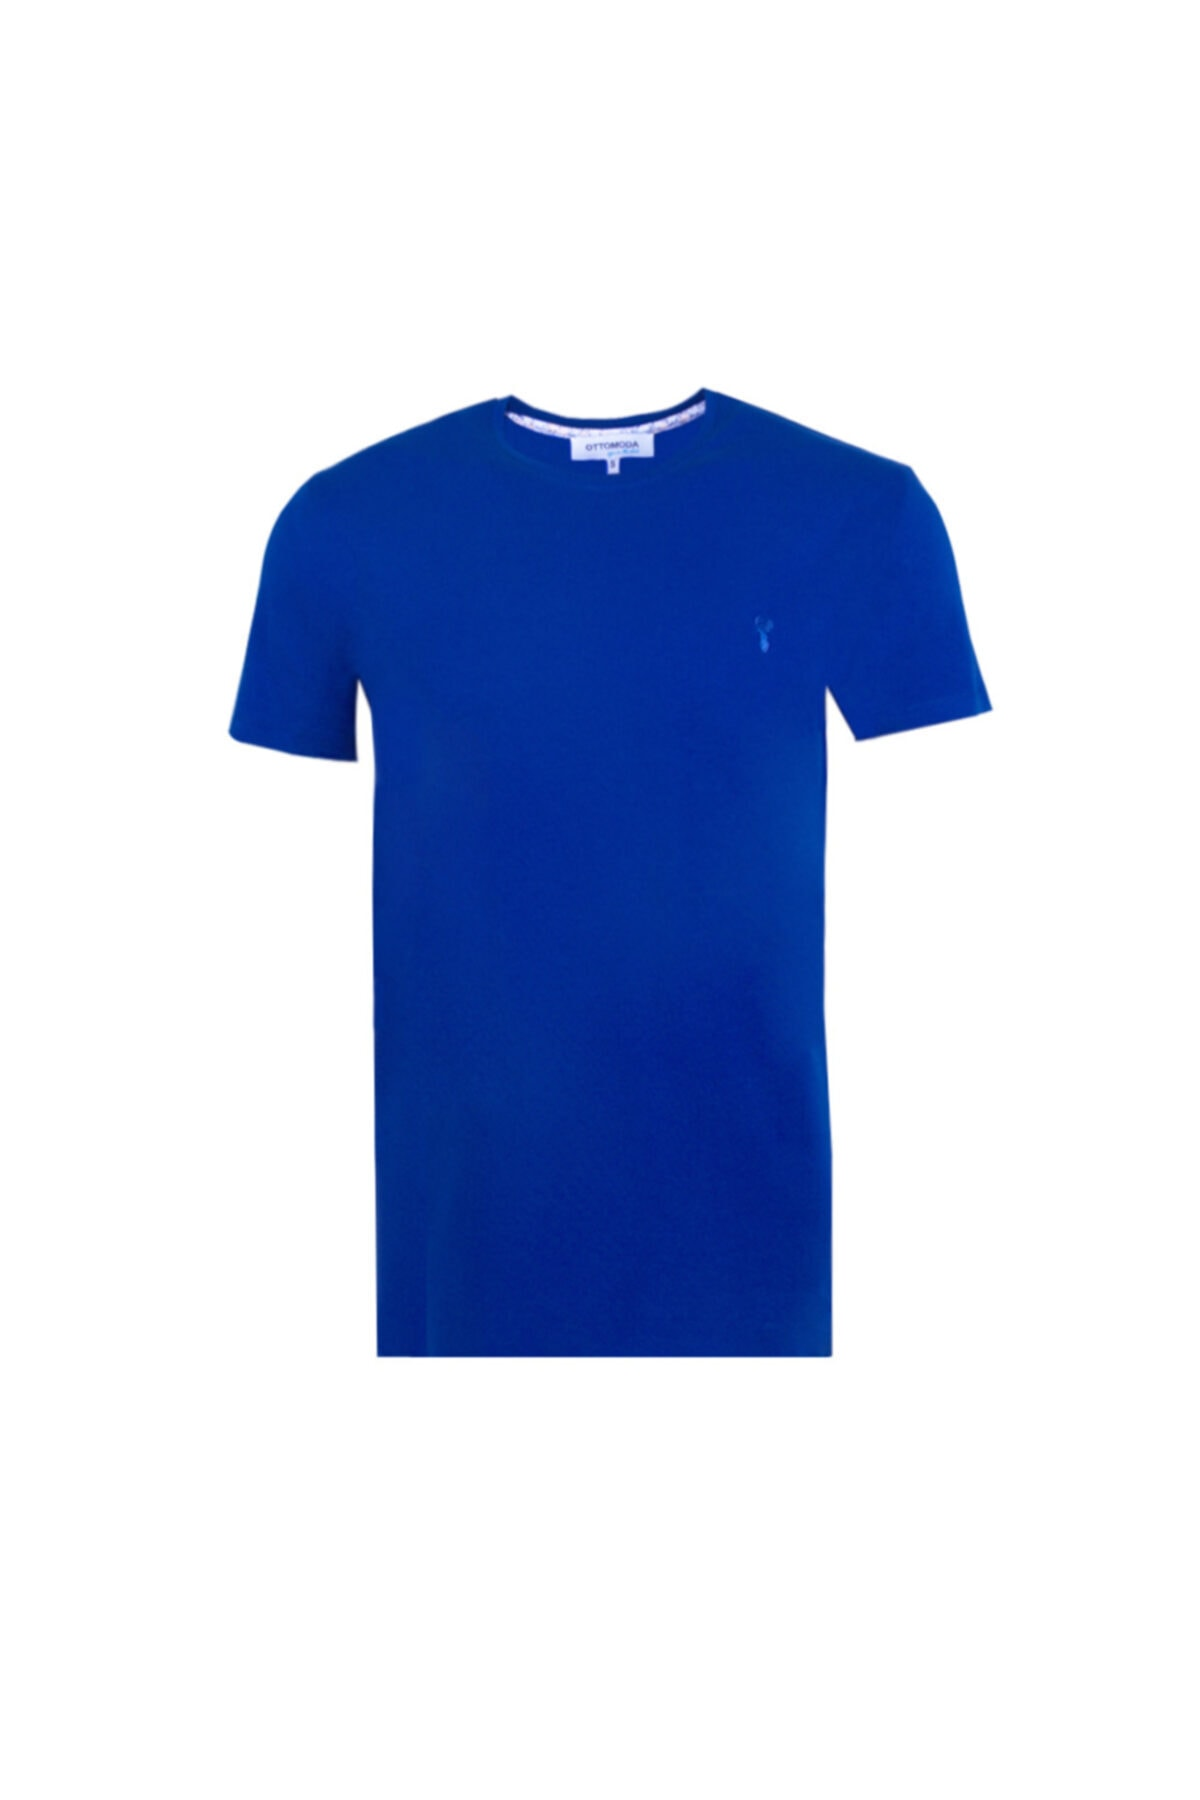 Ottomoda Erkek T-shirt Mavi 1